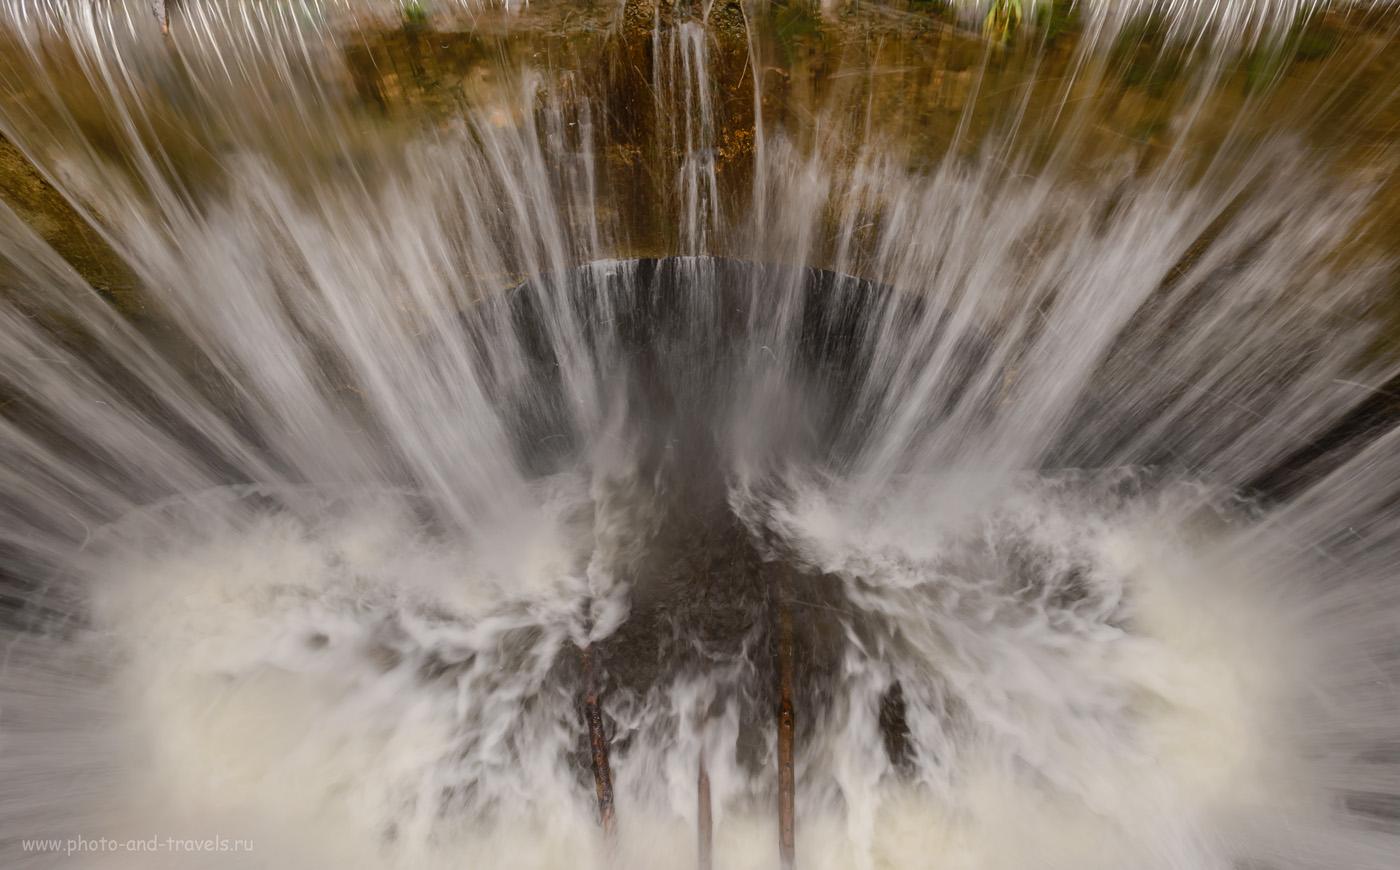 Фотография 43. «Адъ» на плотине пруда в селе Ашап. 1/8, 6.3, 250, 17.